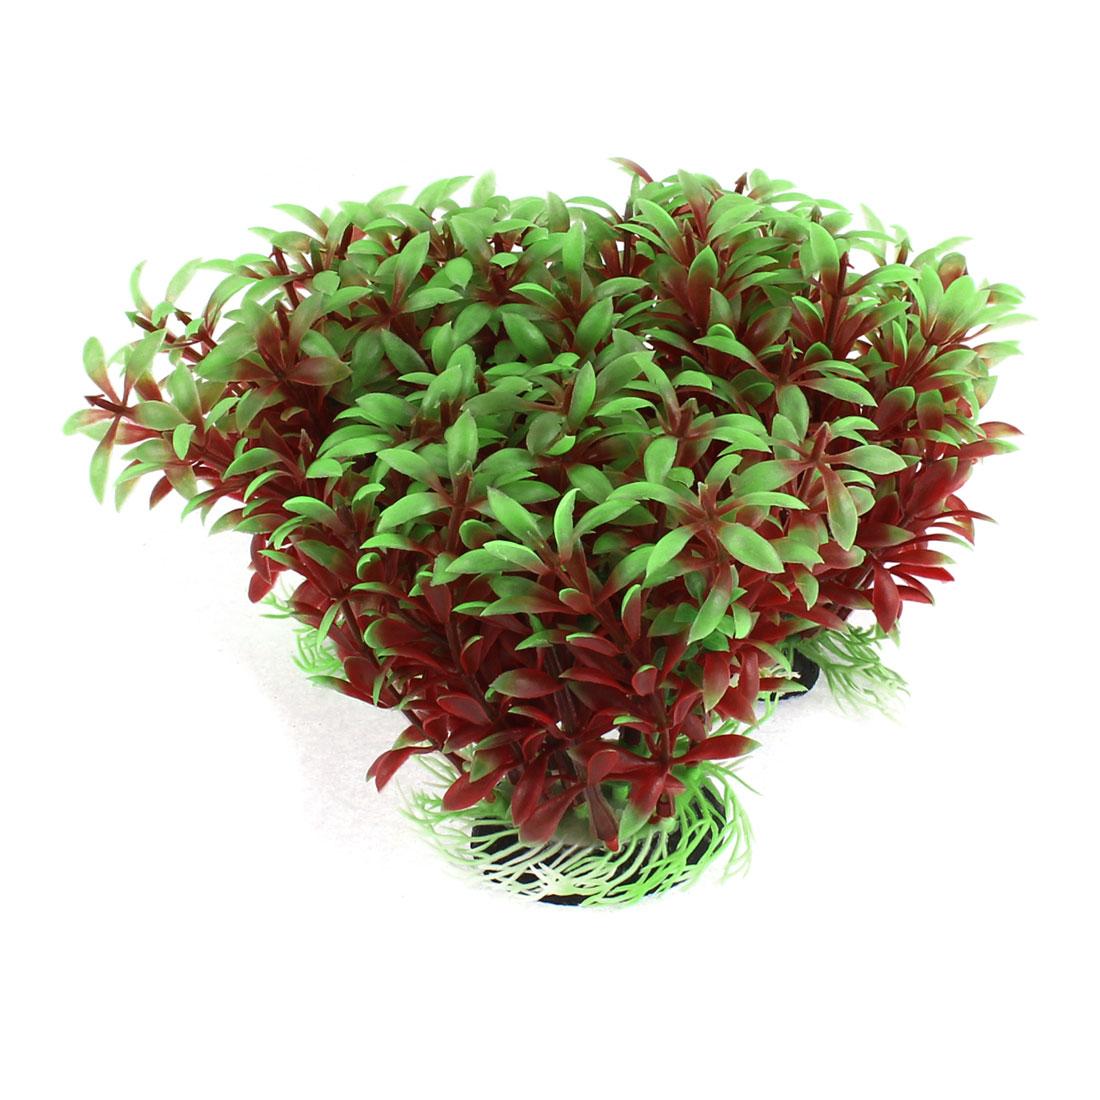 Aquarium Fishbowl Artificial Landscaping Plant Grass Decoration 12x14cm 3pcs